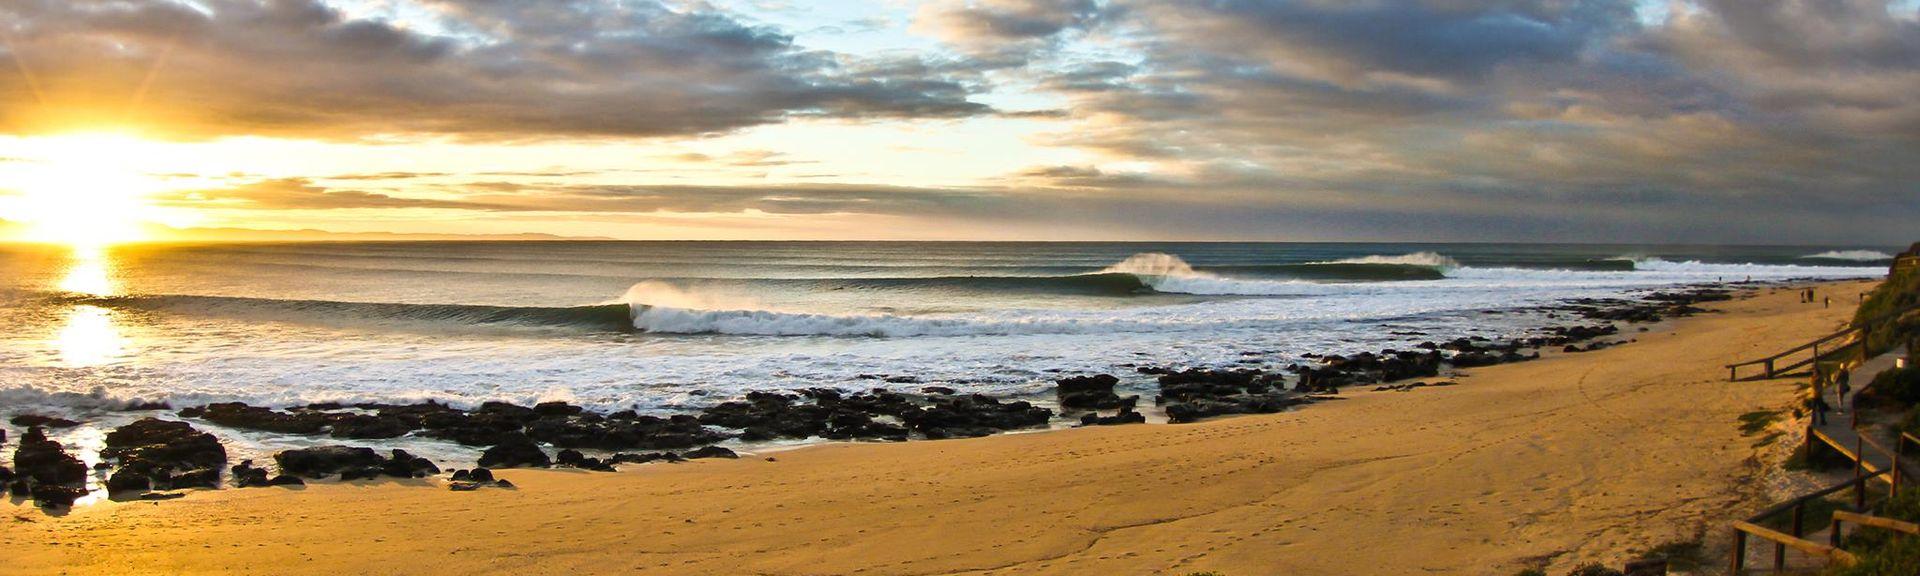 Wavecrest, Jeffreys Bay, Eastern Cape, South Africa